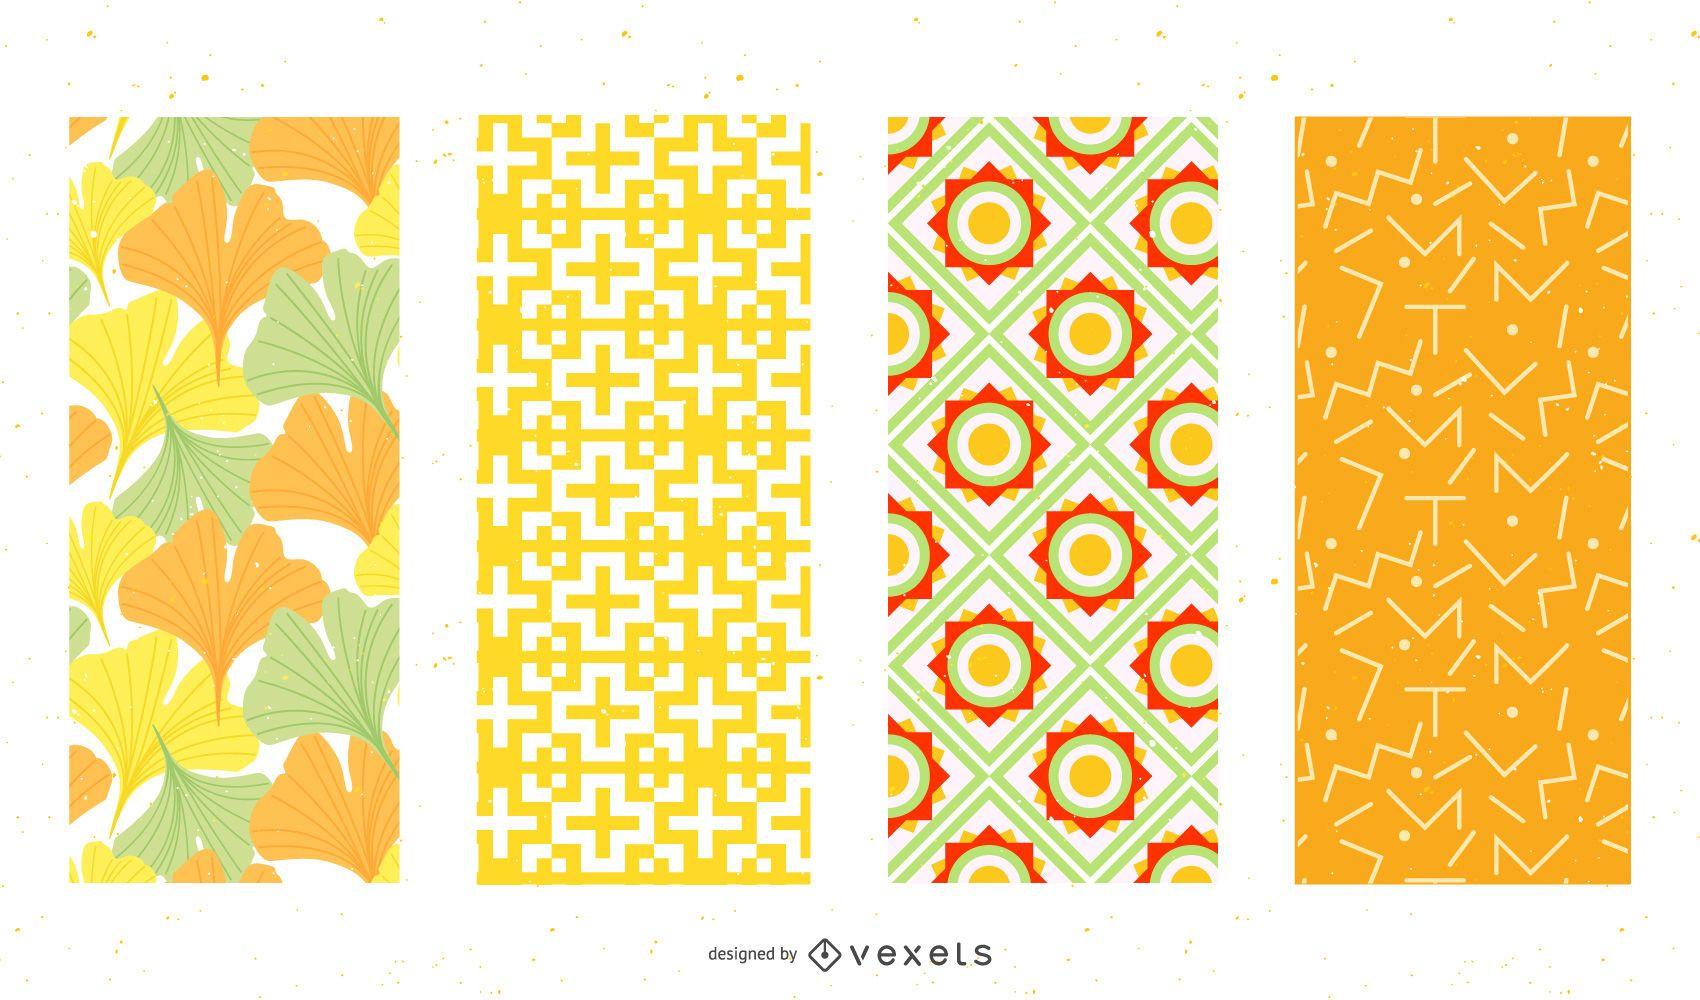 Free Vector Patterns Set 03